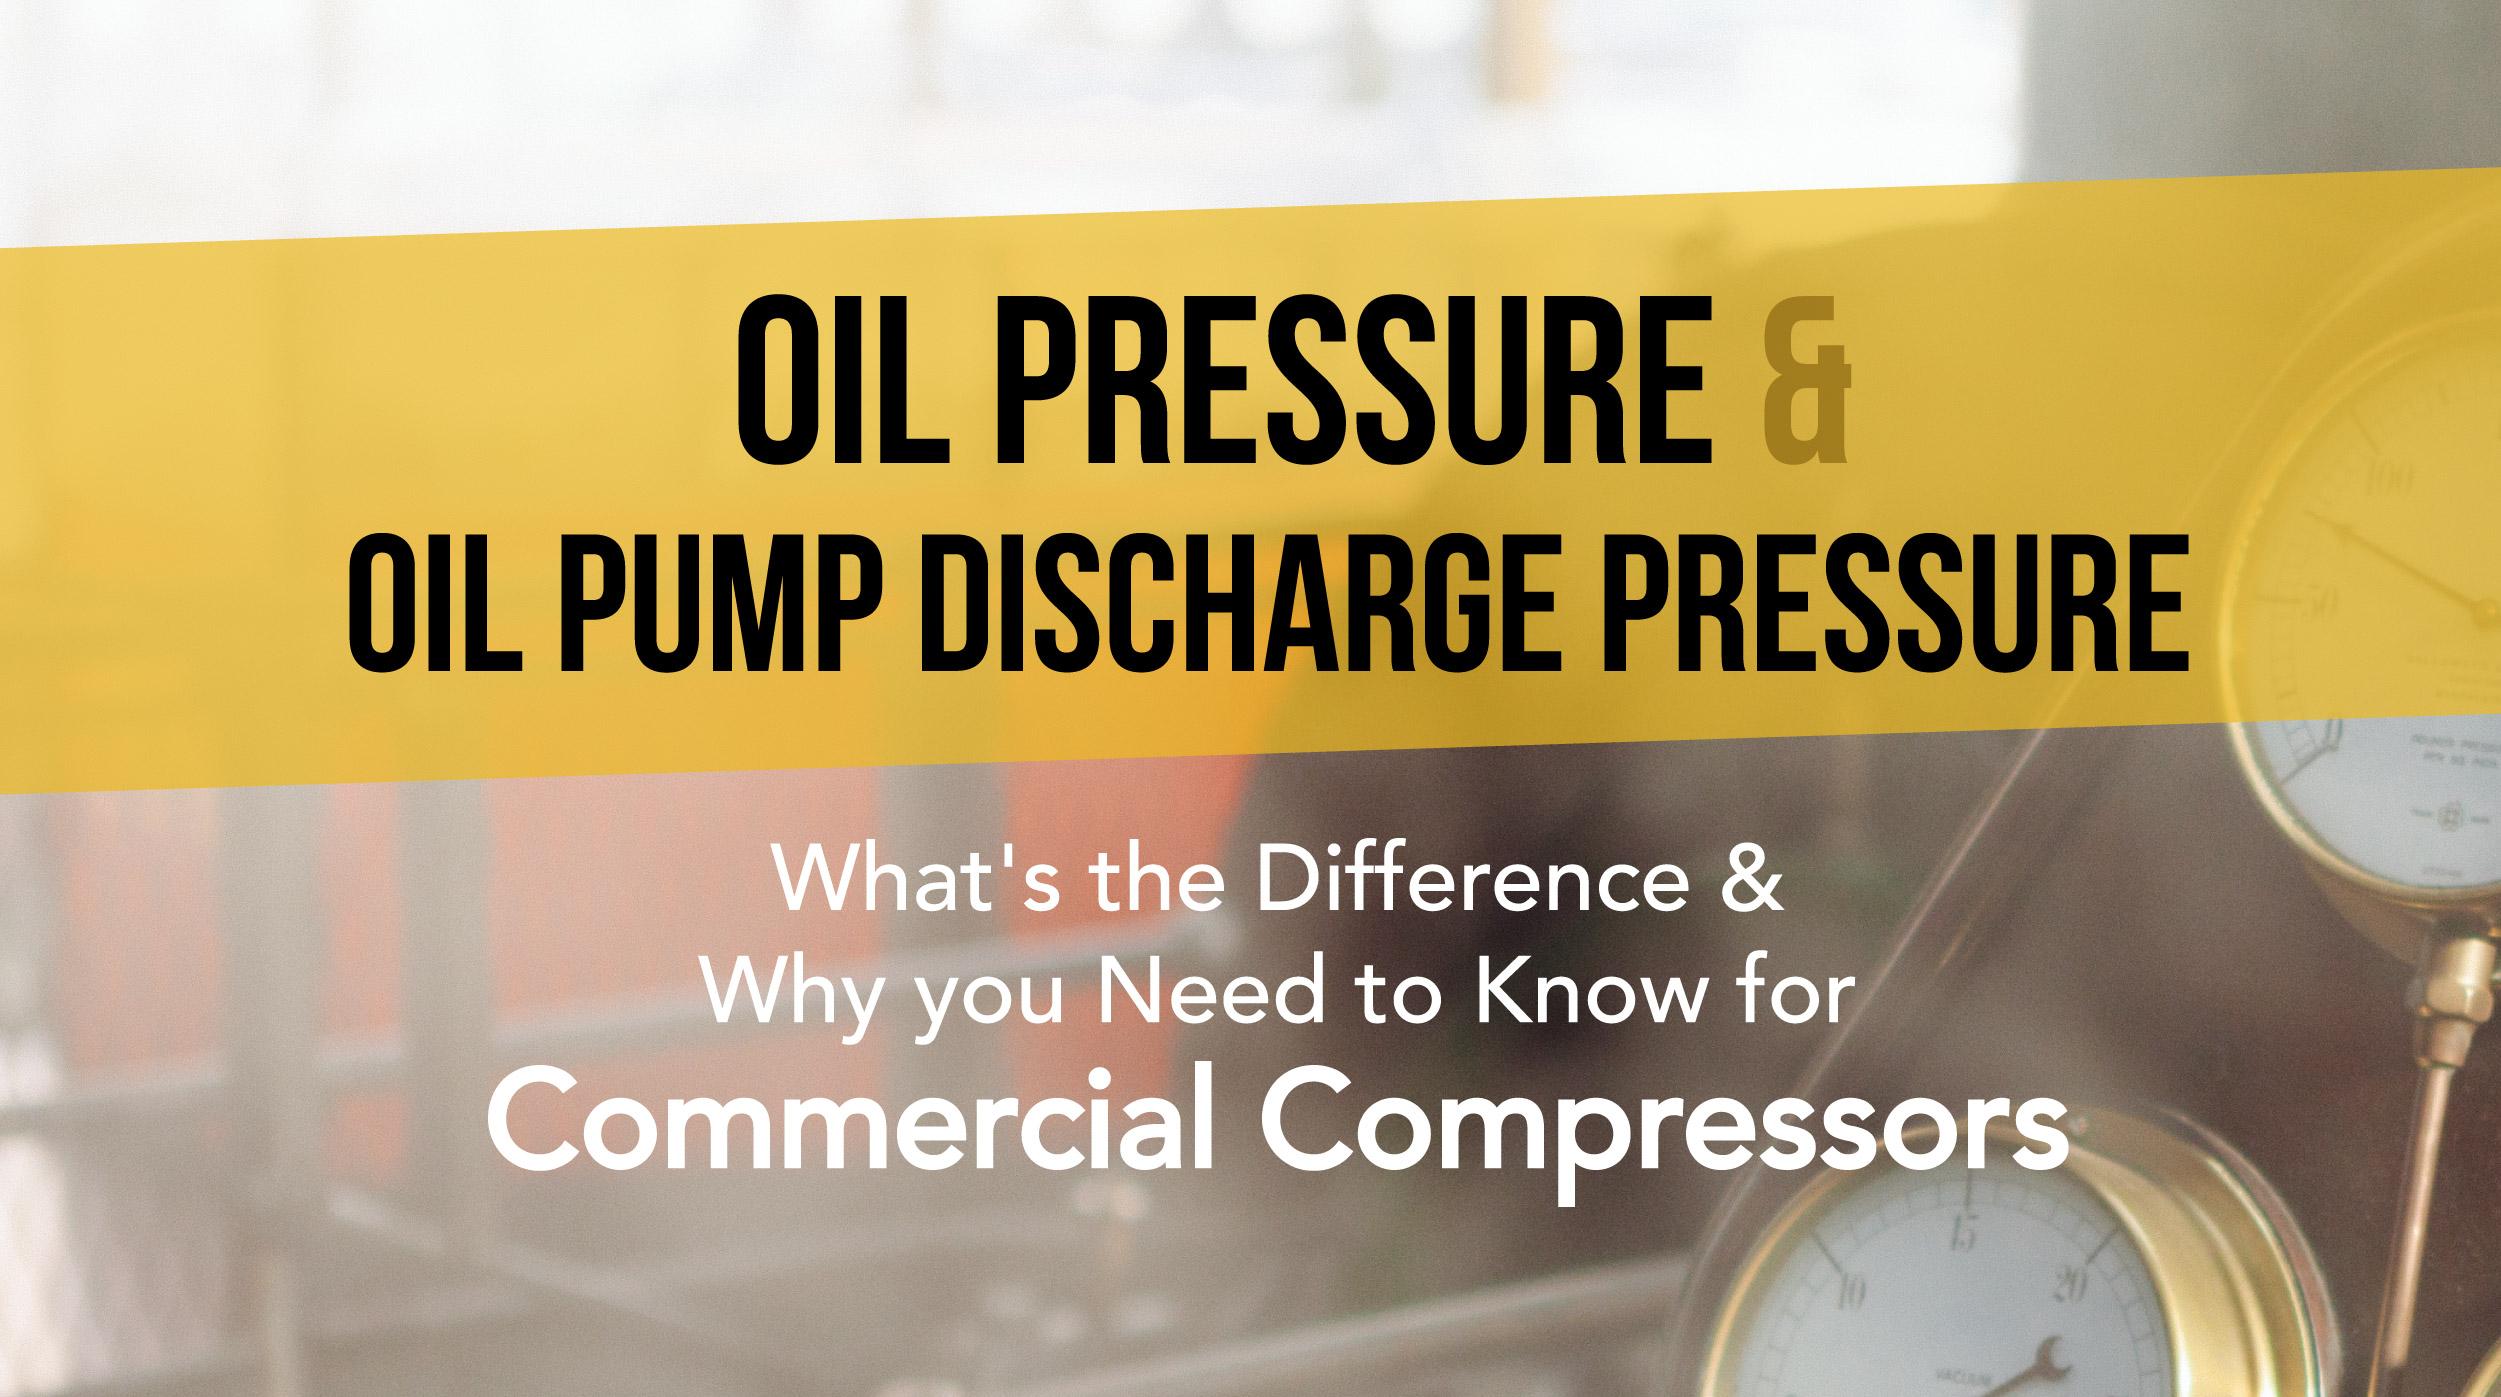 Oil Pressure & Oil Pump Discharge Pressure